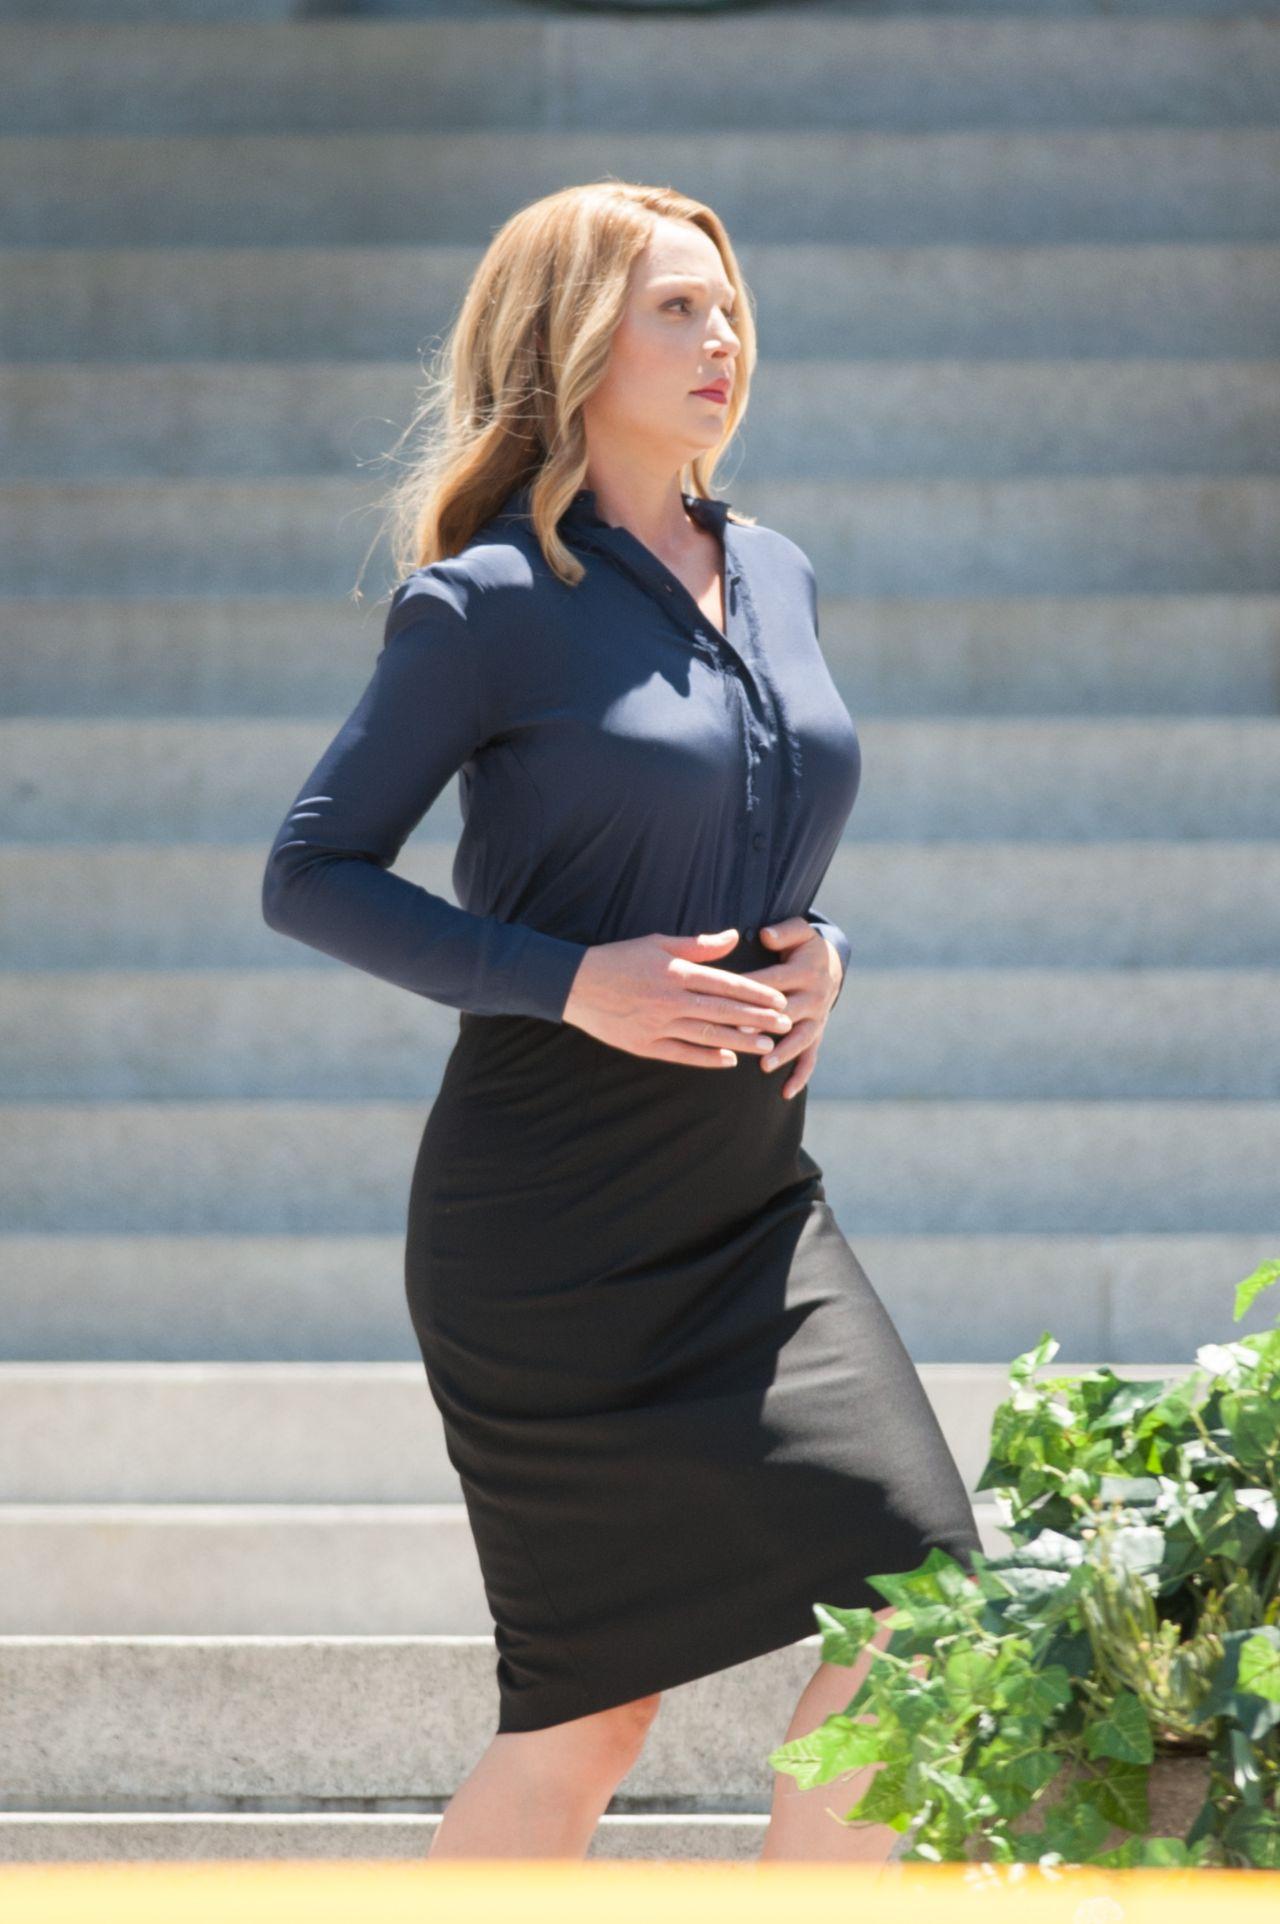 Katherine Heigl Tv Show Doubt Set In Los Angeles 7 26 2016